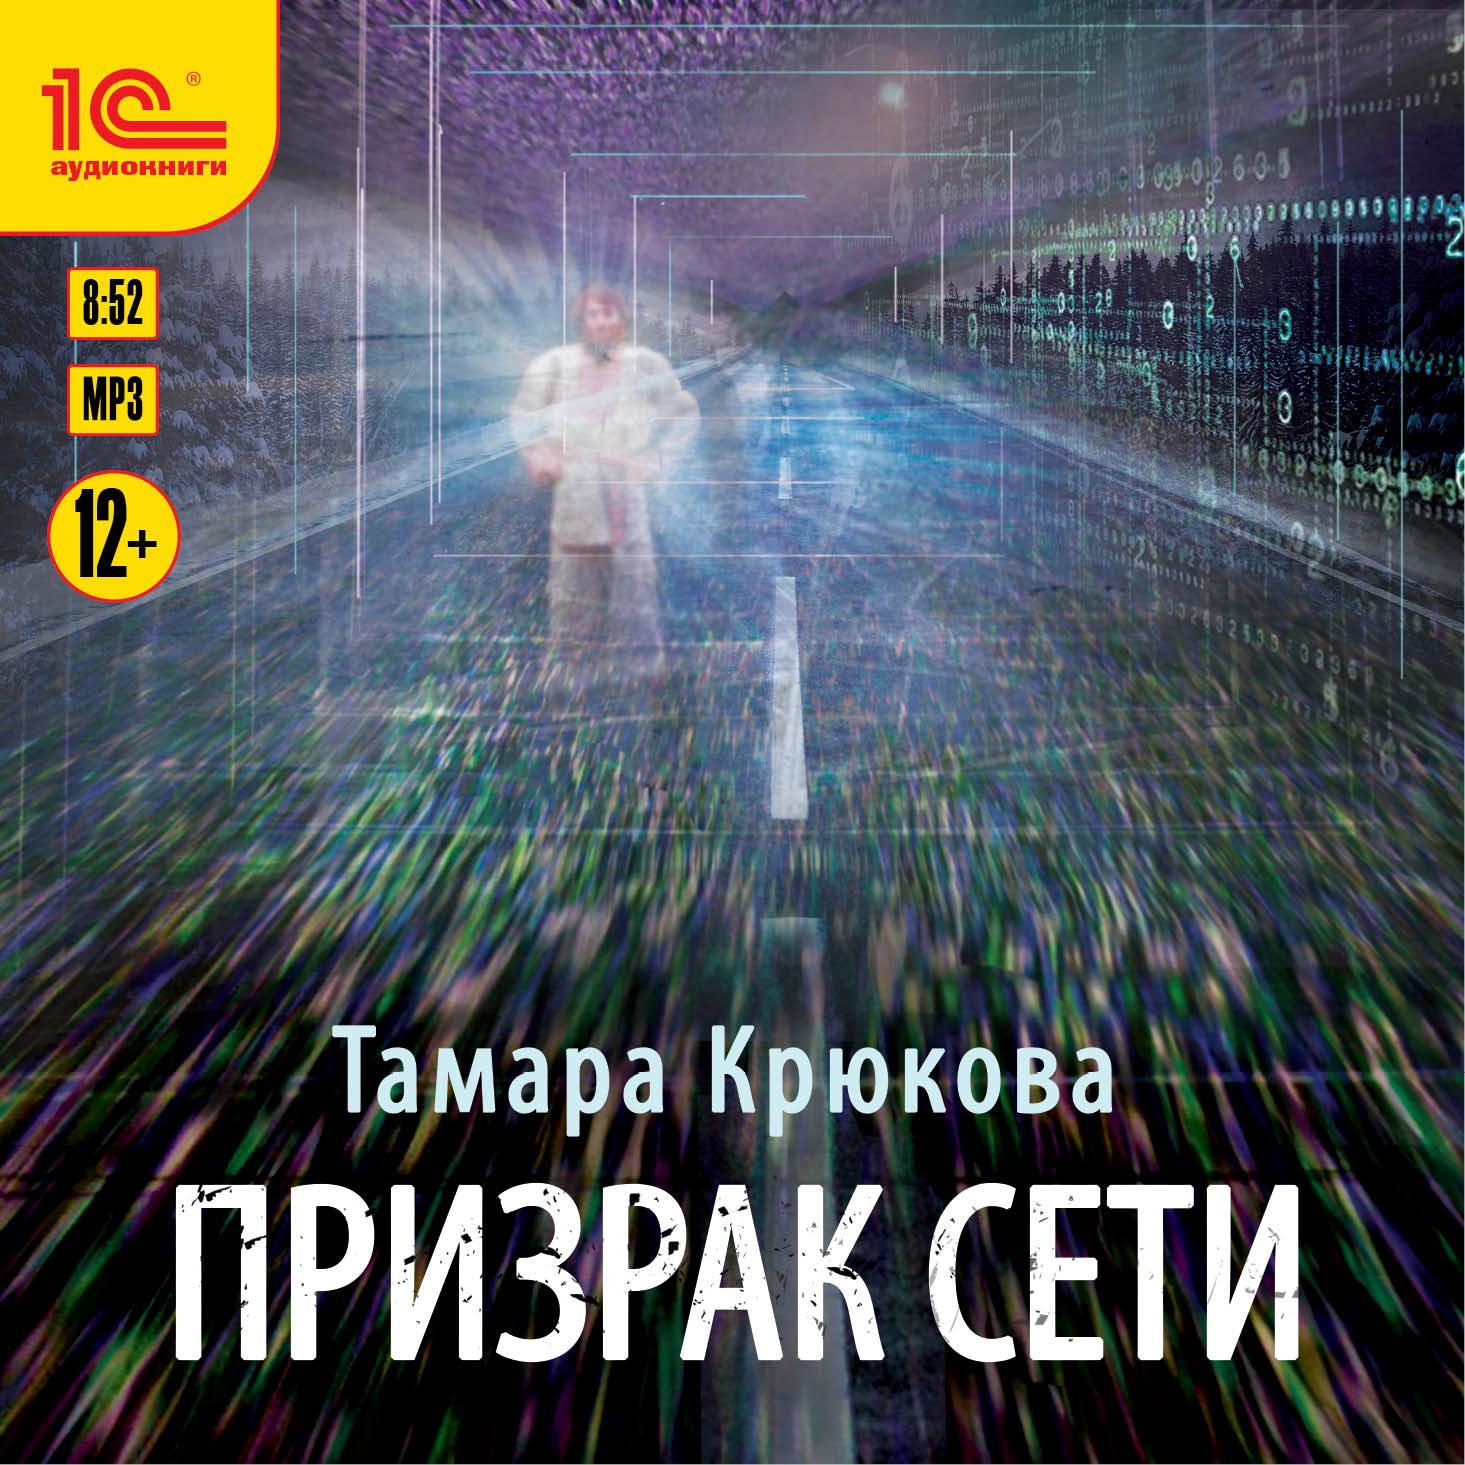 Тамара Крюкова Призрак сети (цифровая версия) (Цифровая версия)